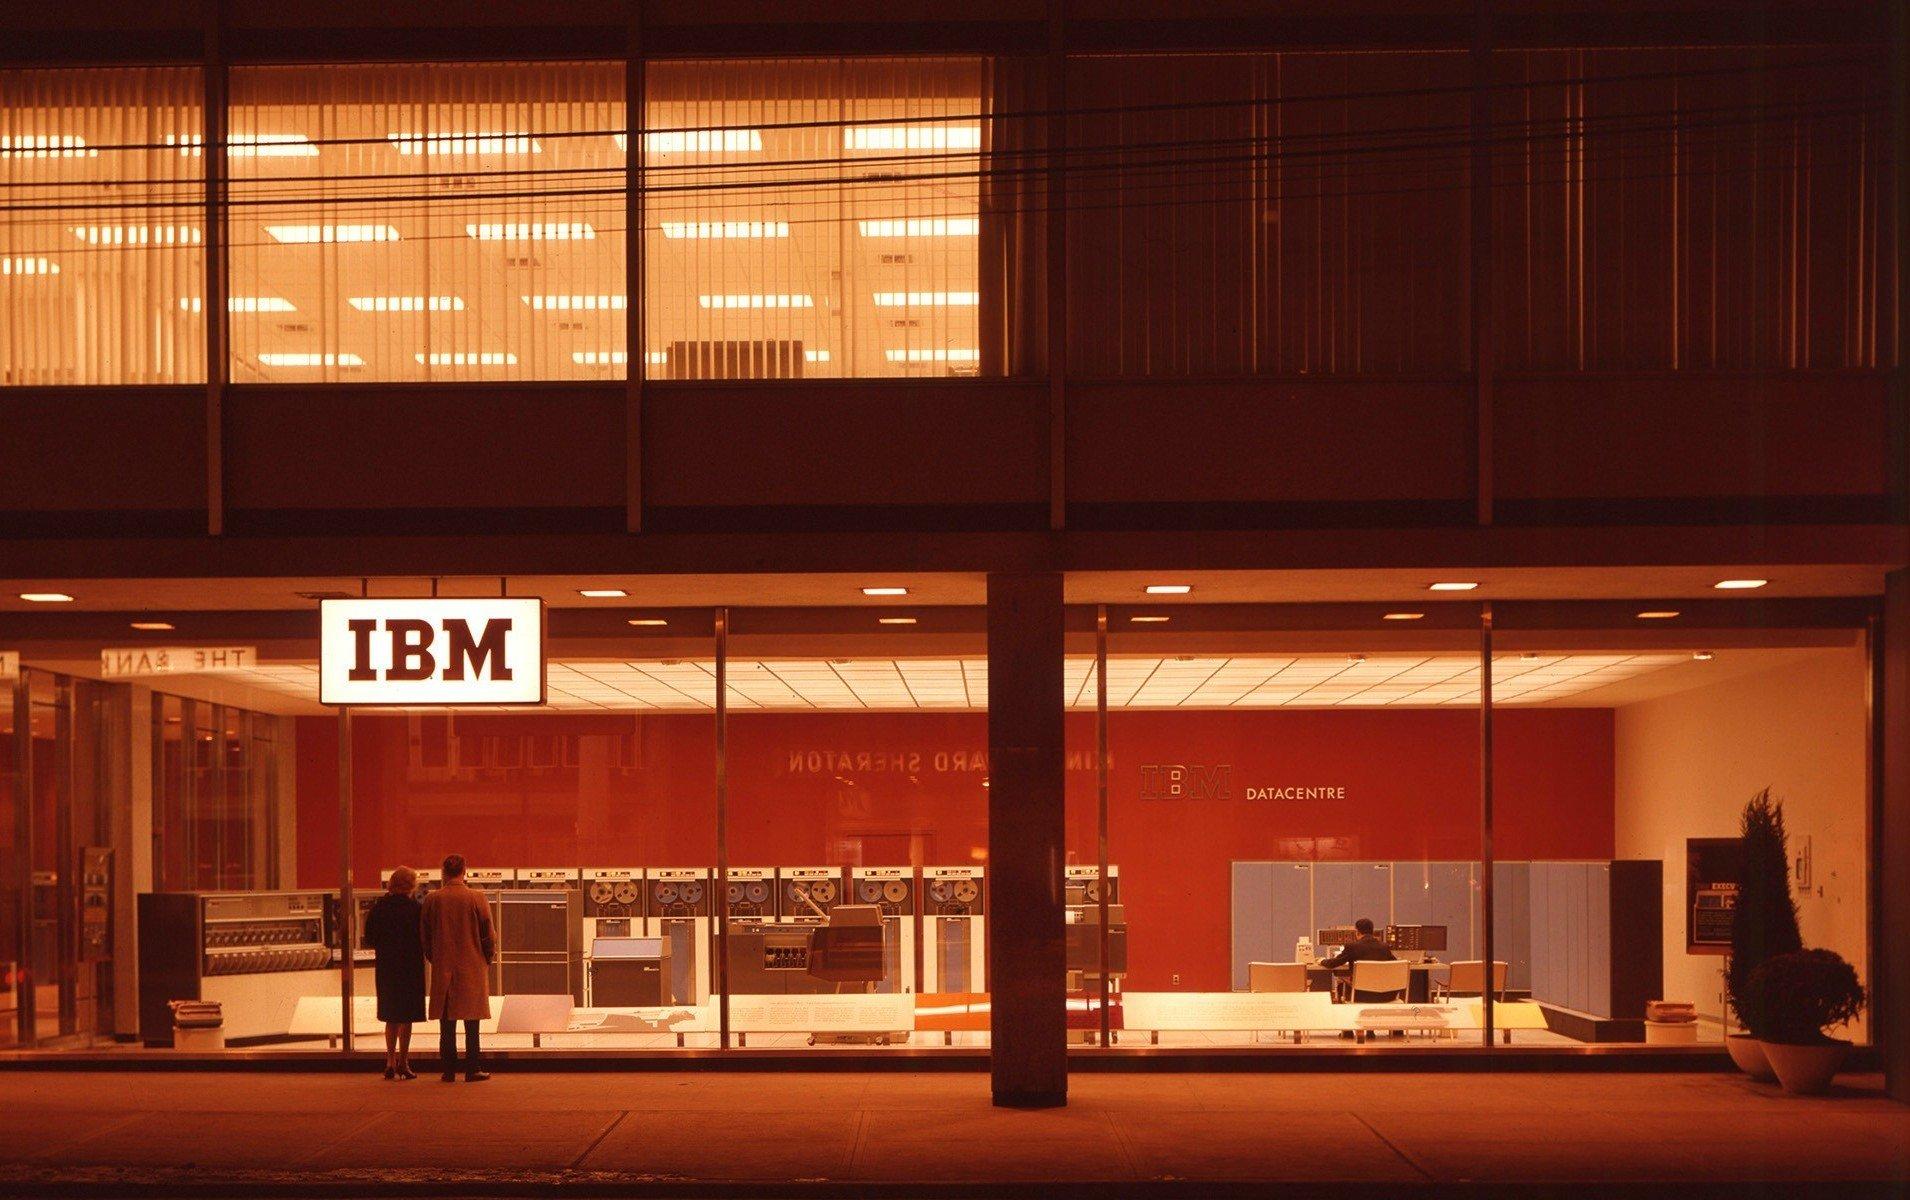 ibm was 8.5 5 documentation